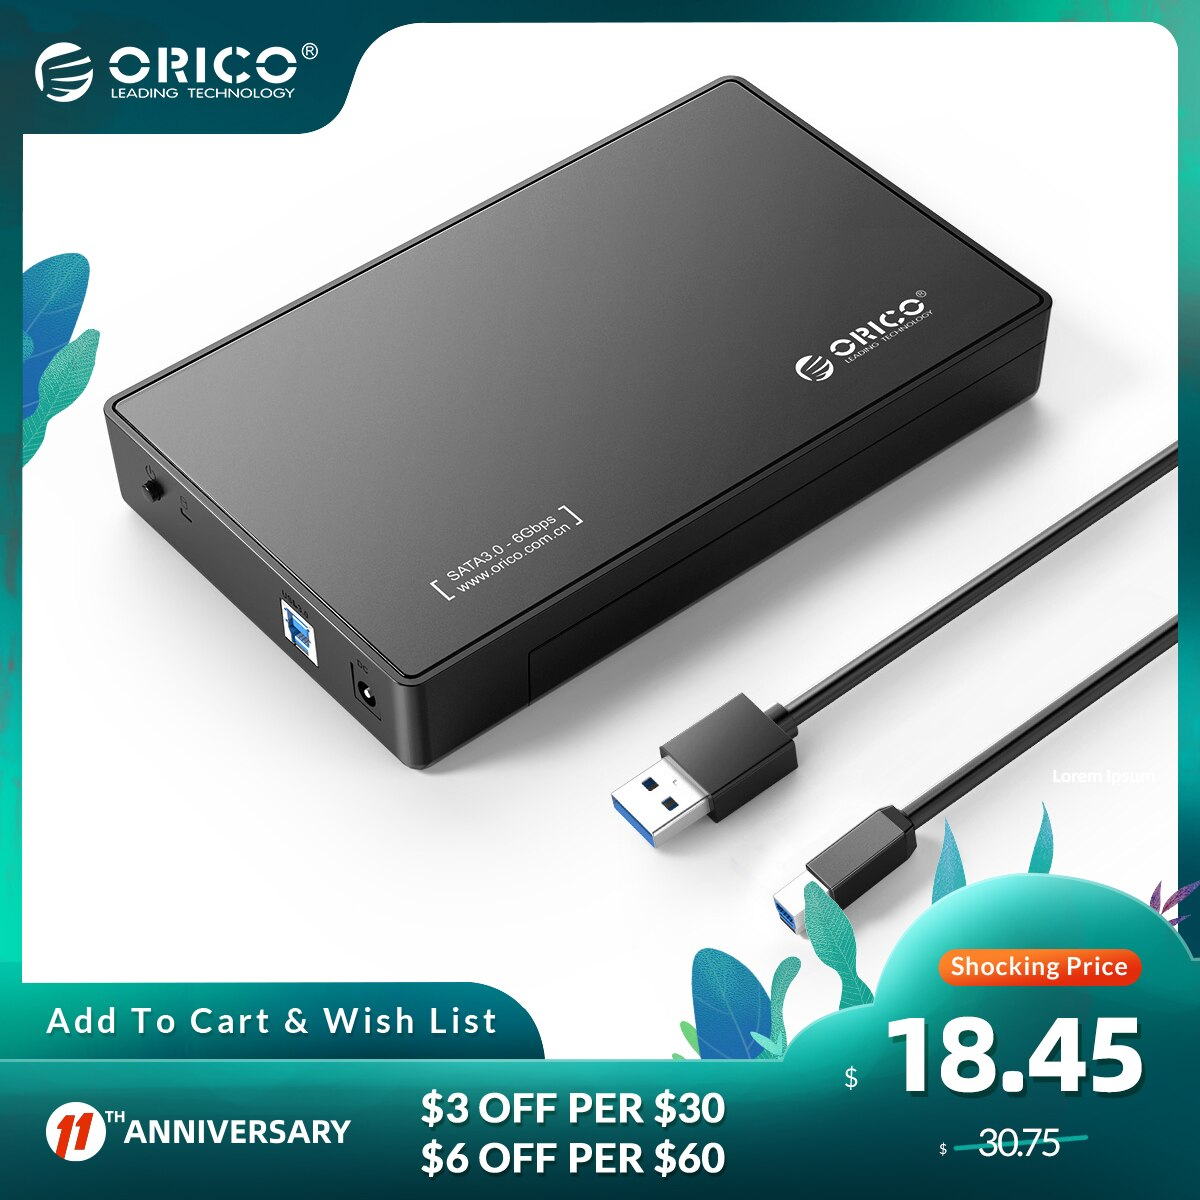 ORICO 3588US3 HDD Enclosure 3.5 inch SATA External Hard Drive Enclosure USB 3.0 HDD Case Tool Free  for 3.5